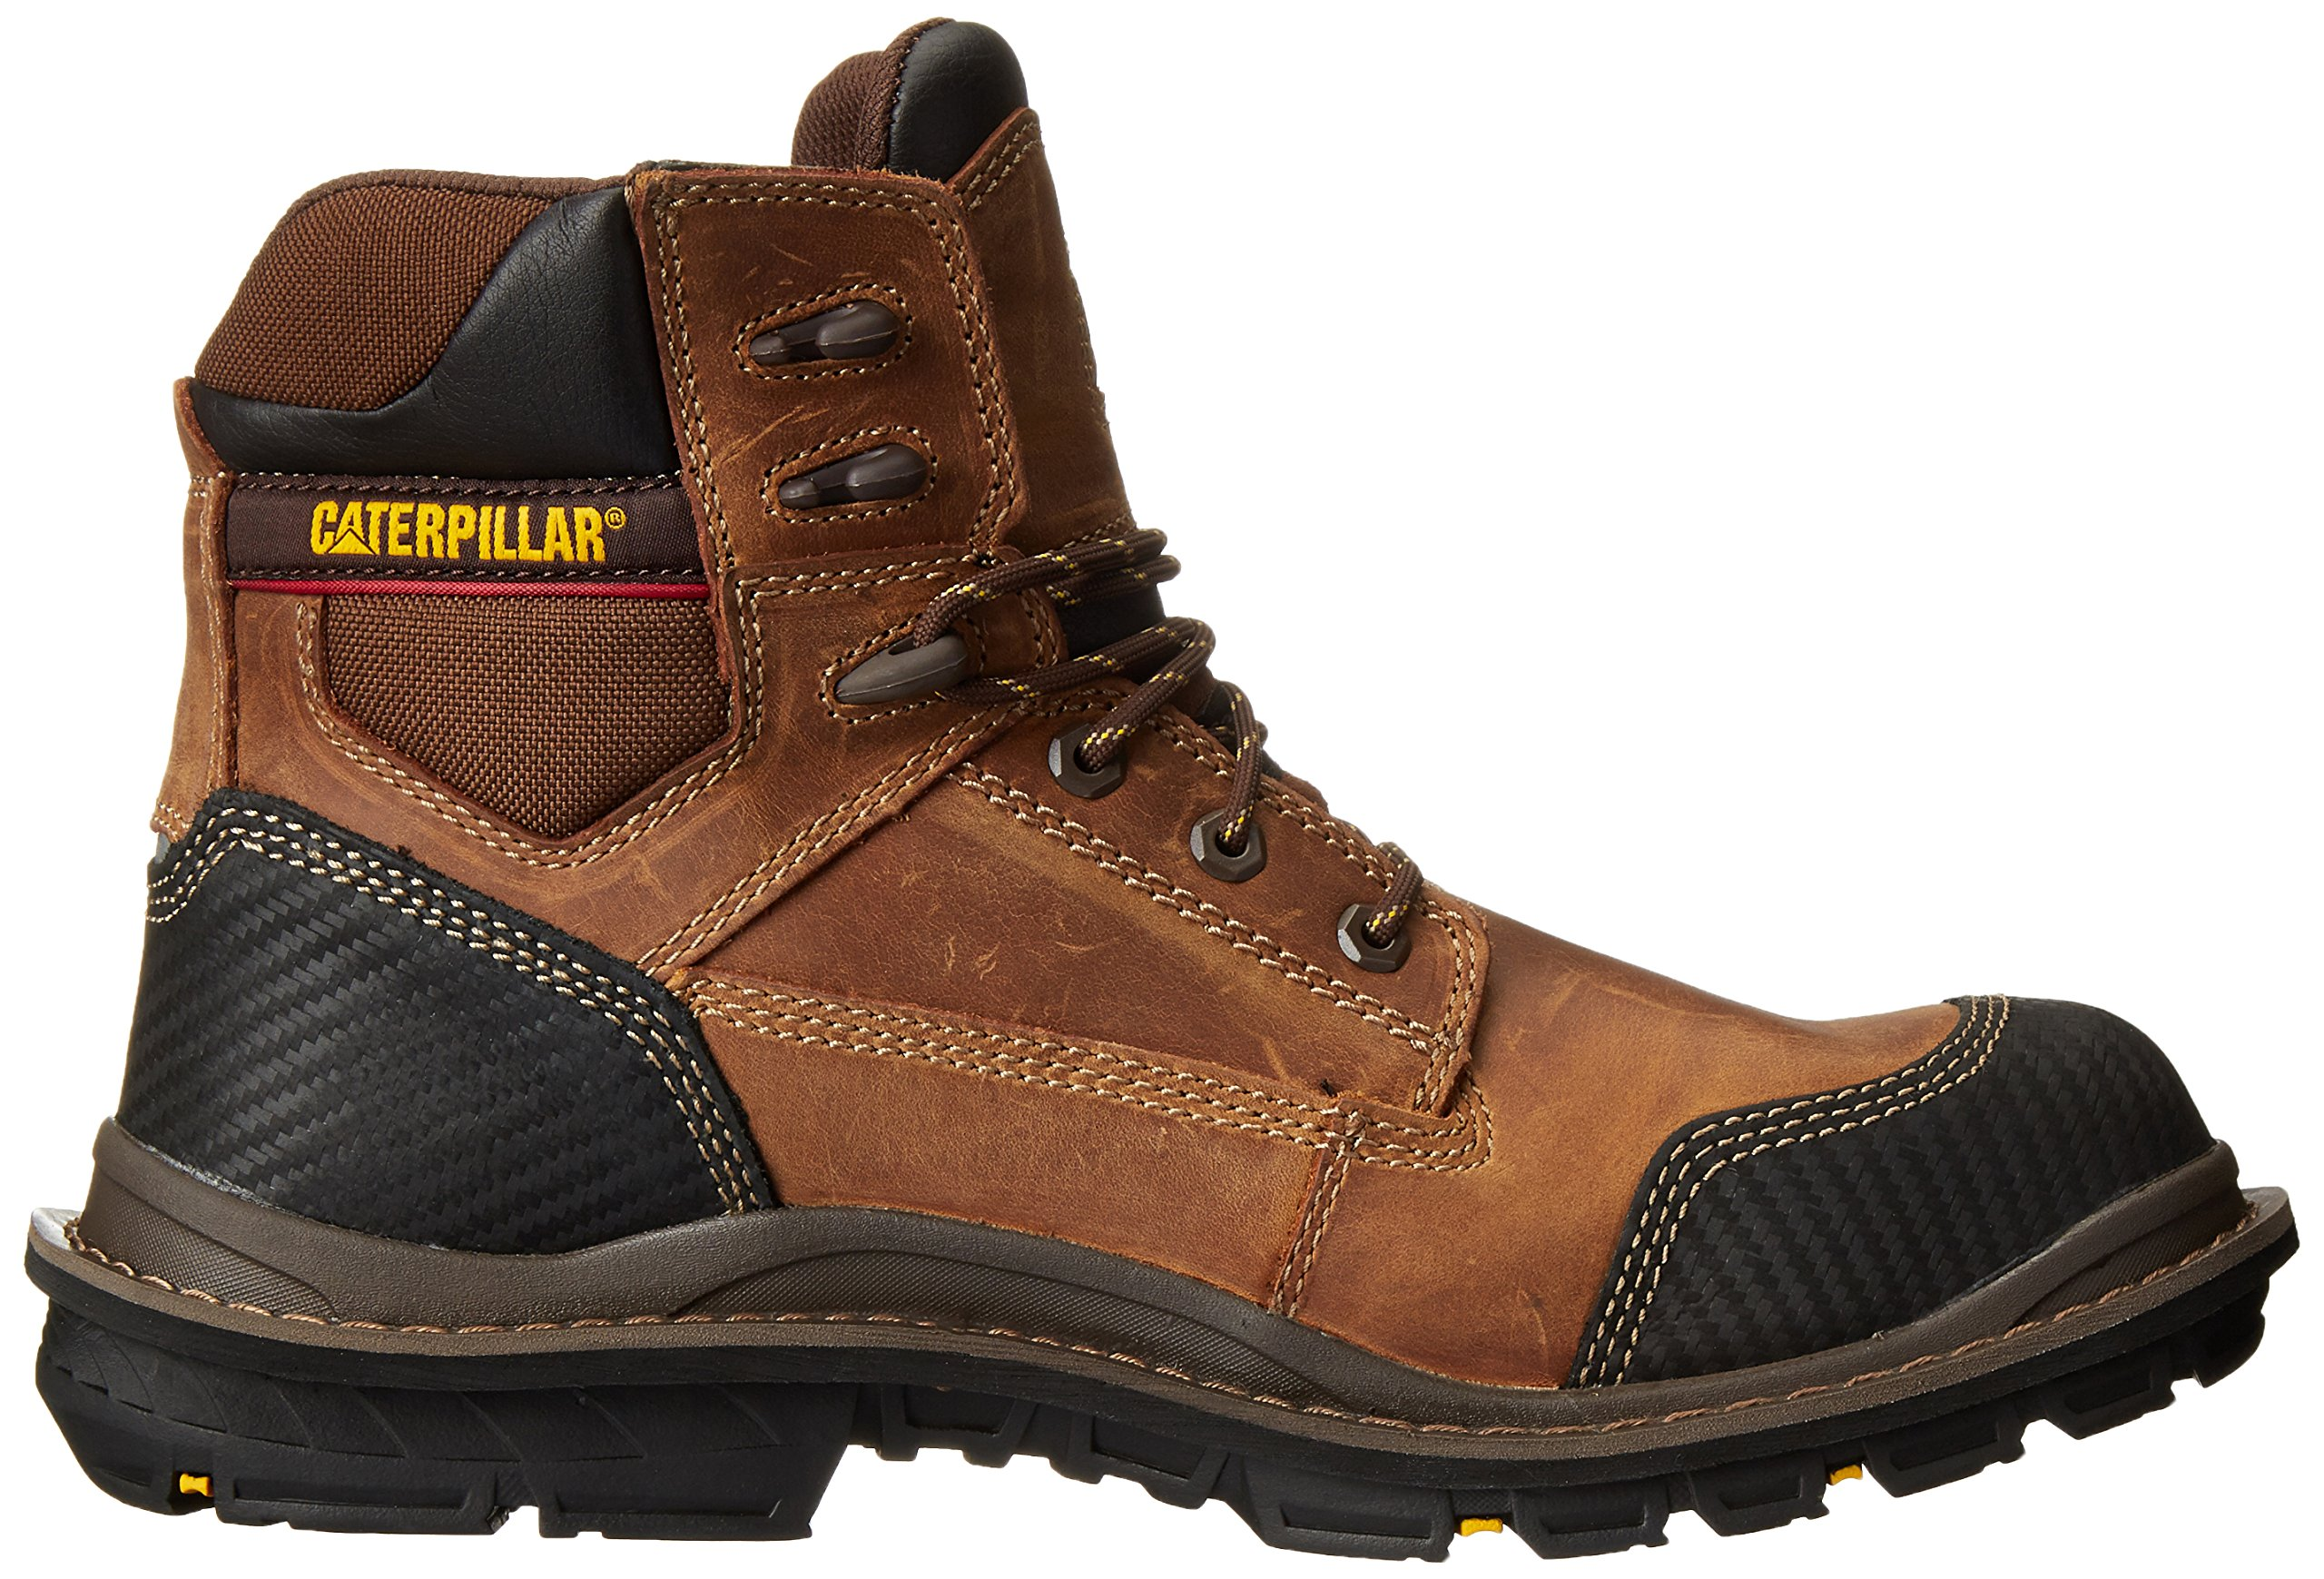 Caterpillar Men's Fabricate 6 Inch Tough Waterproof Comp Toe Work Boot, Brown, 14 M US by Caterpillar (Image #7)